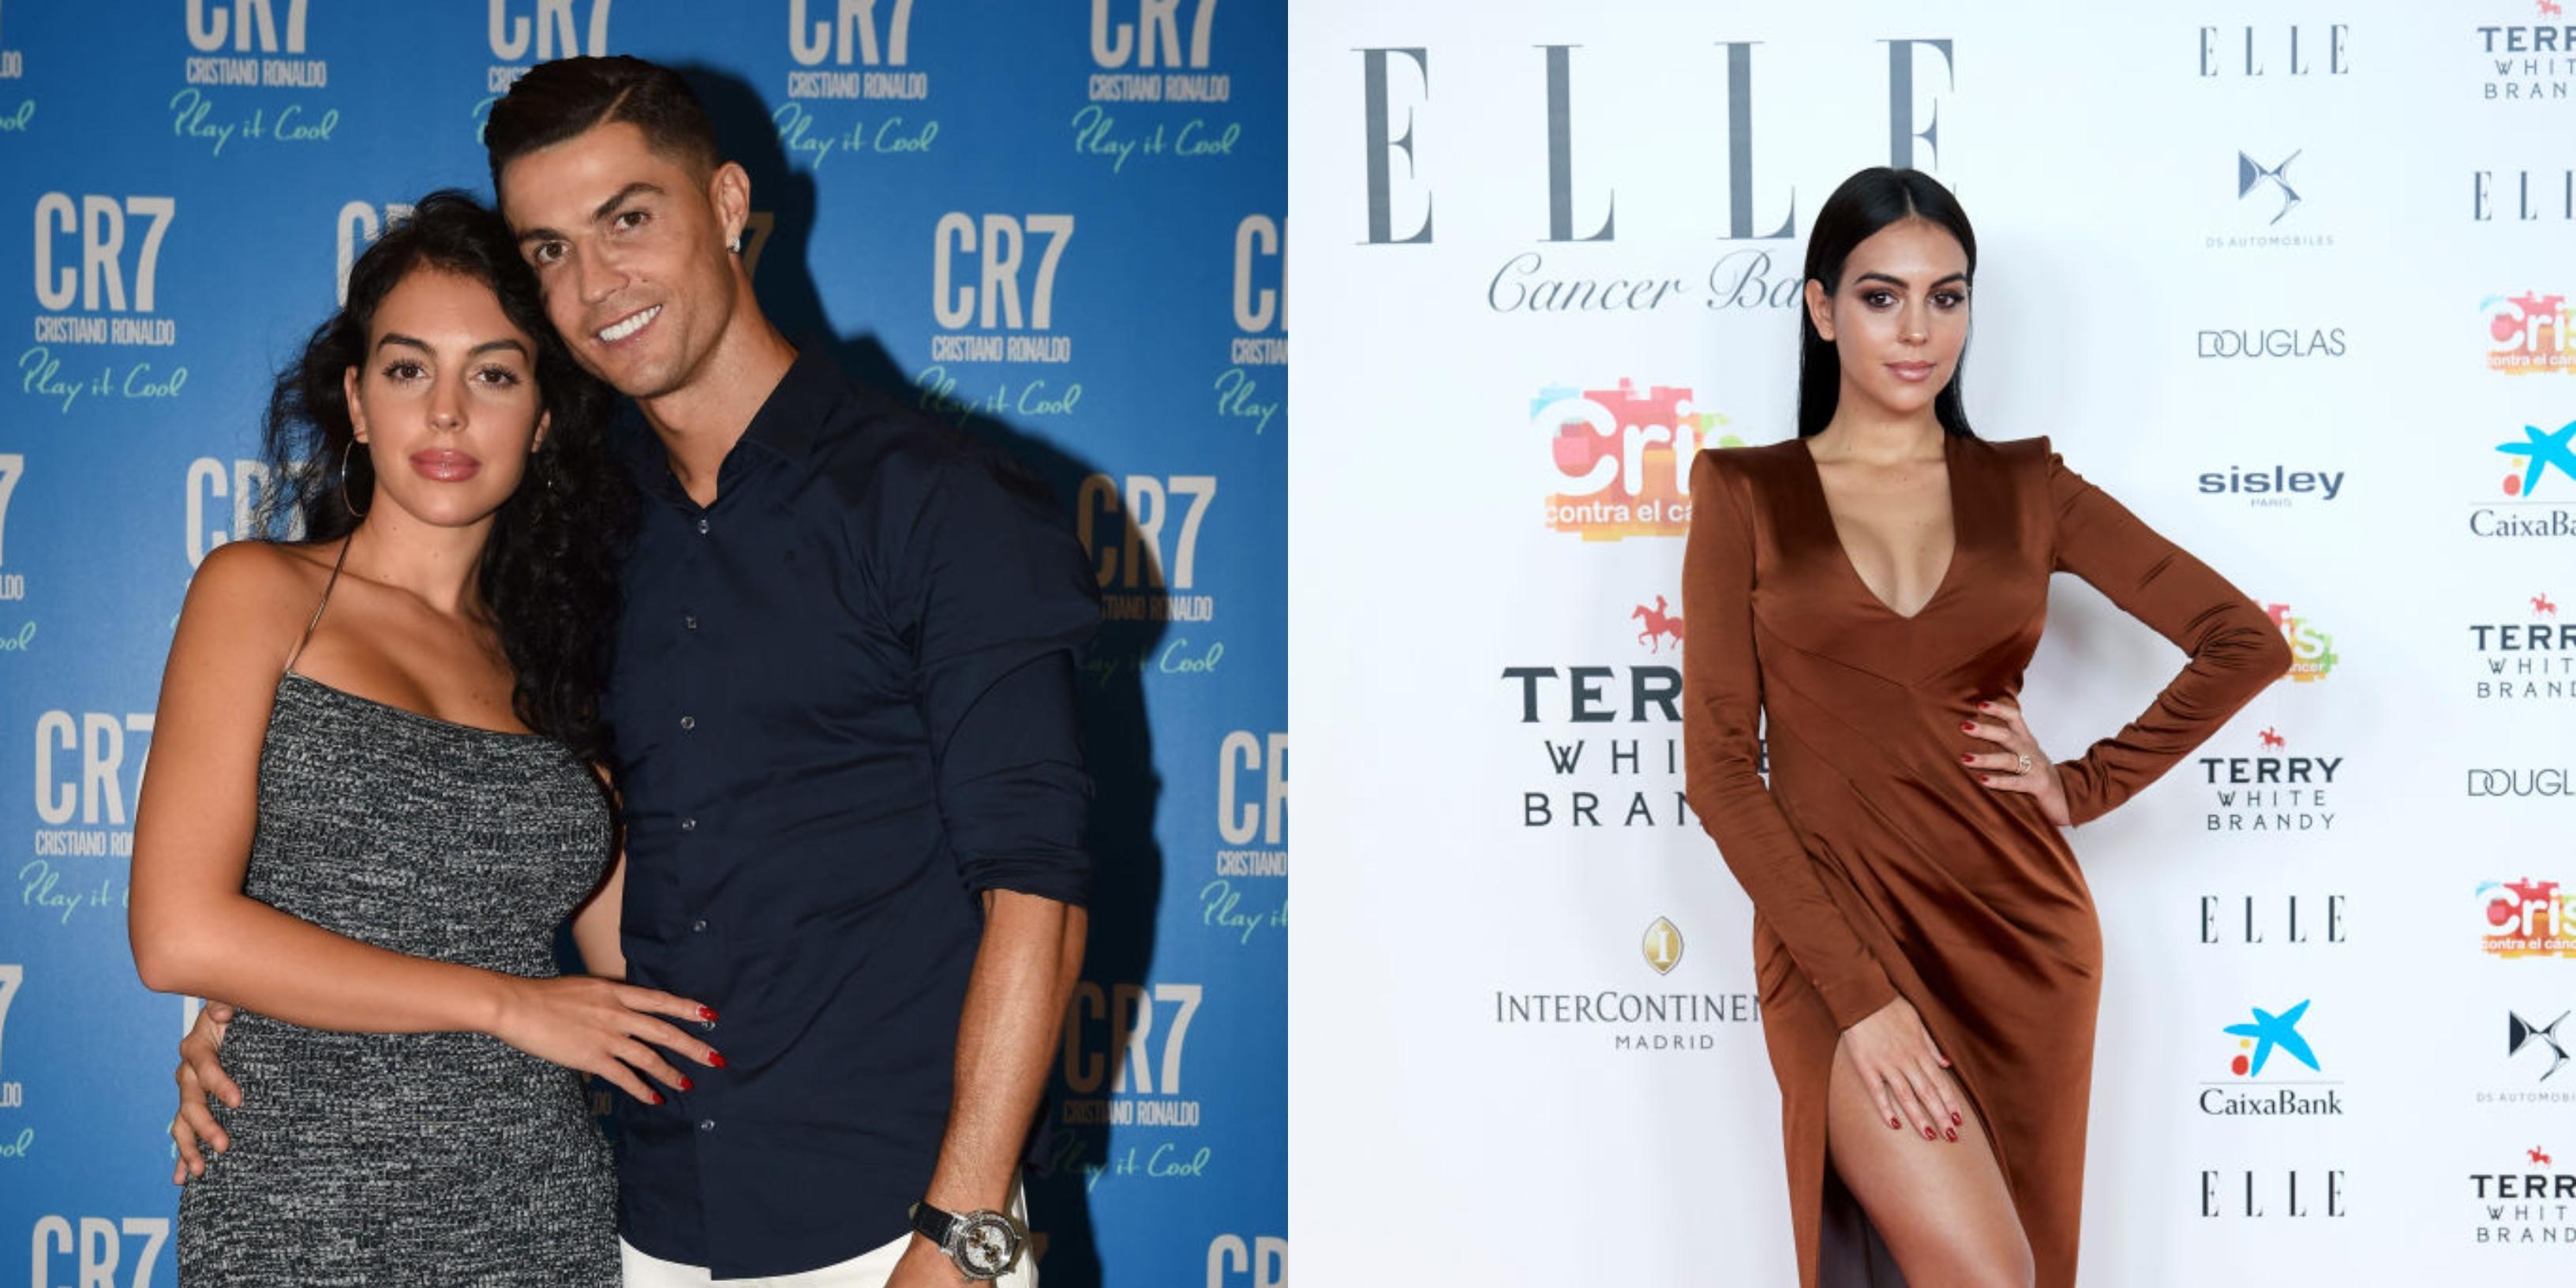 Cristiano Ronaldo S Gf Georgina Rodriguez Rocks Thong On Yacht Trip With Soccer Star Pics Total Pro Sports